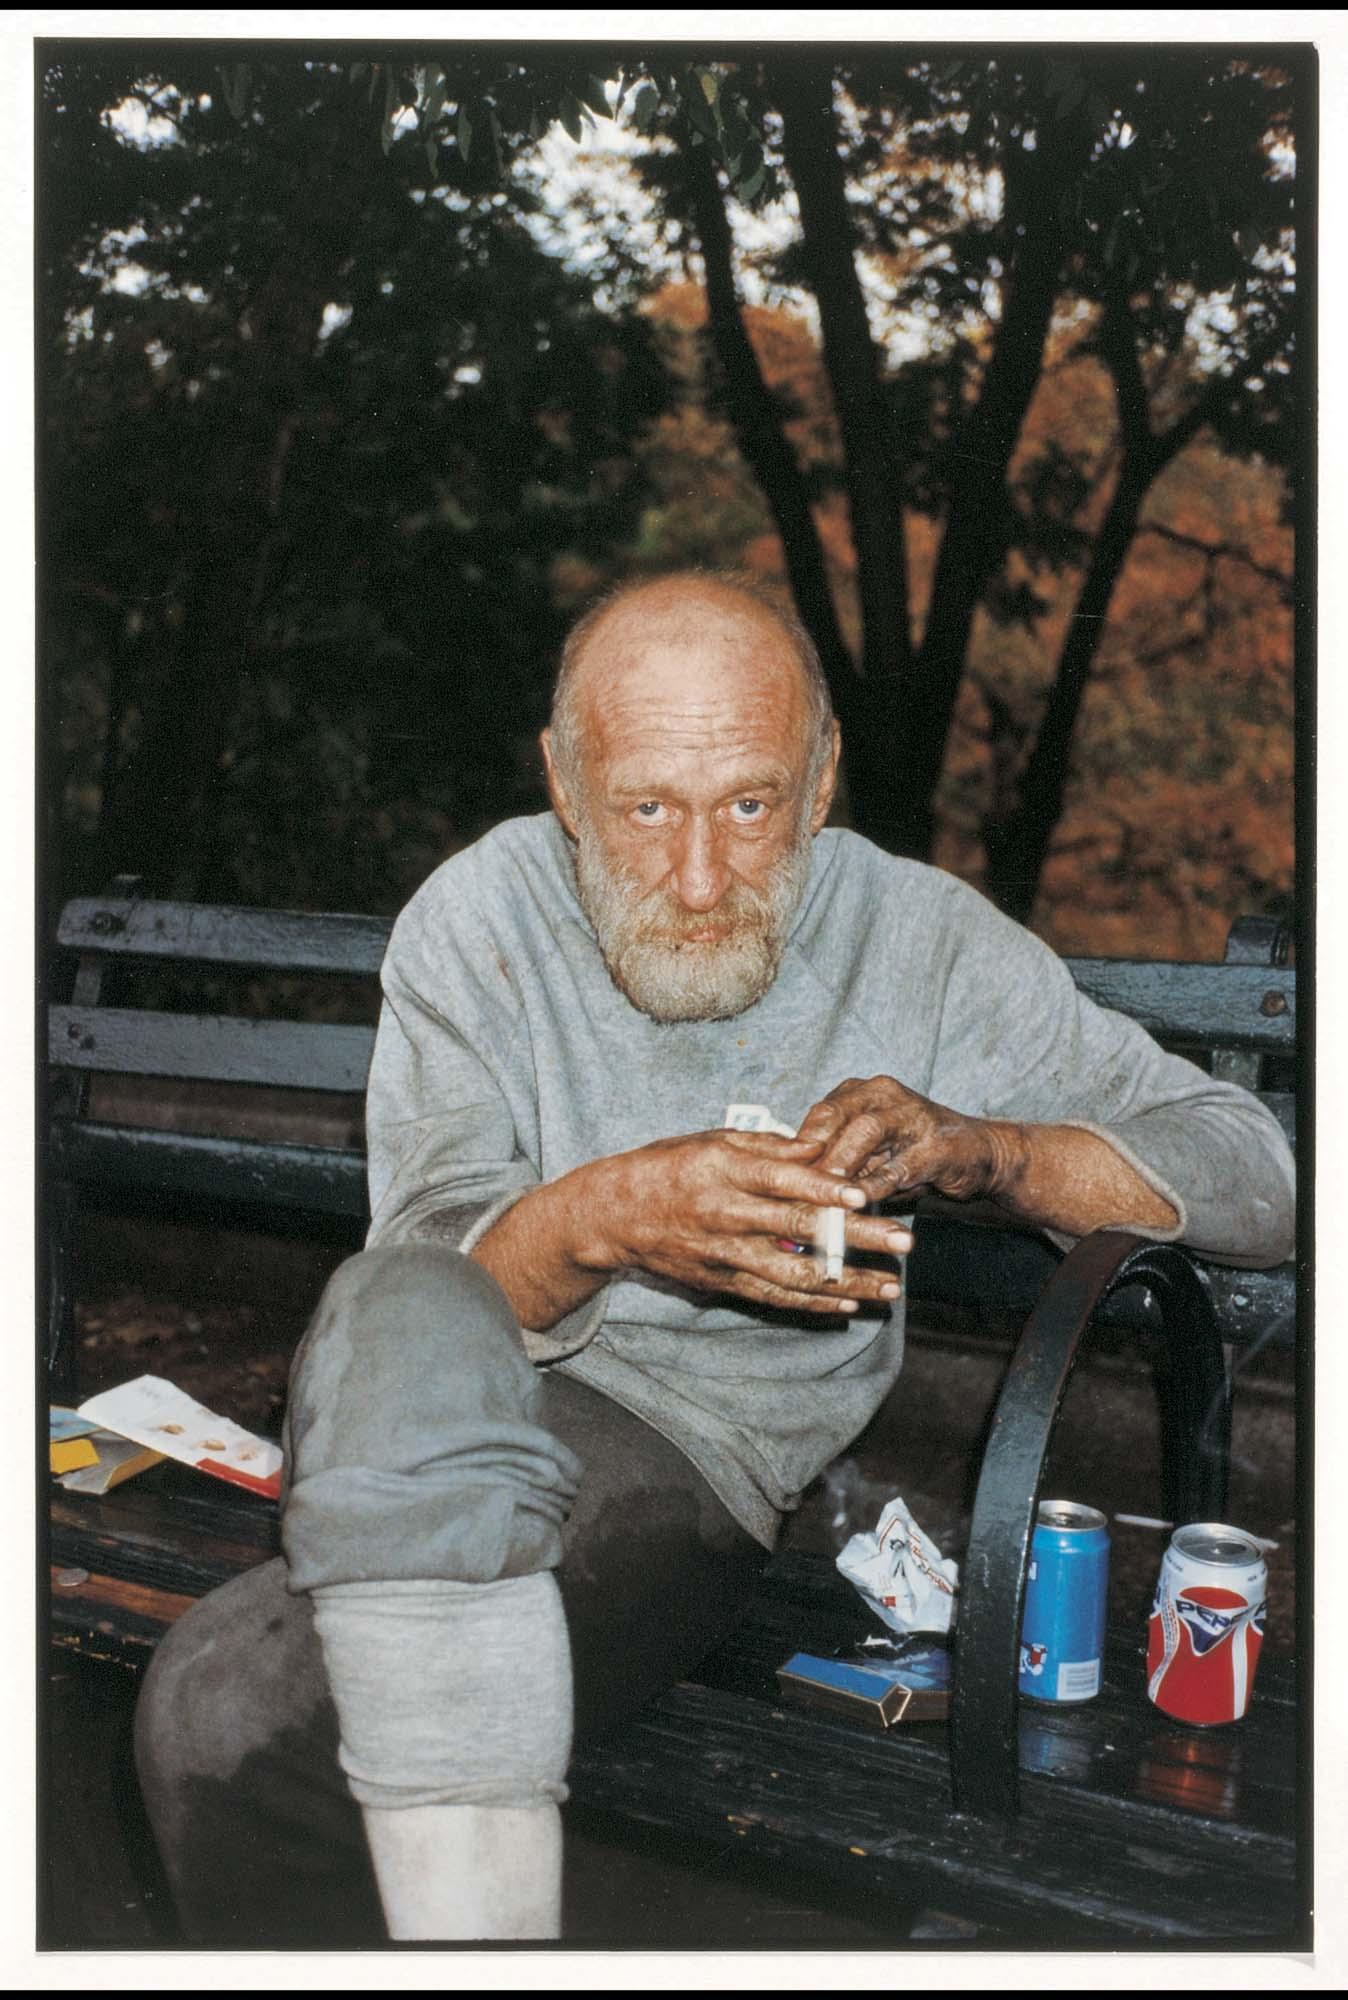 WilliamHeydt-Photographs-43181AR2.jpg